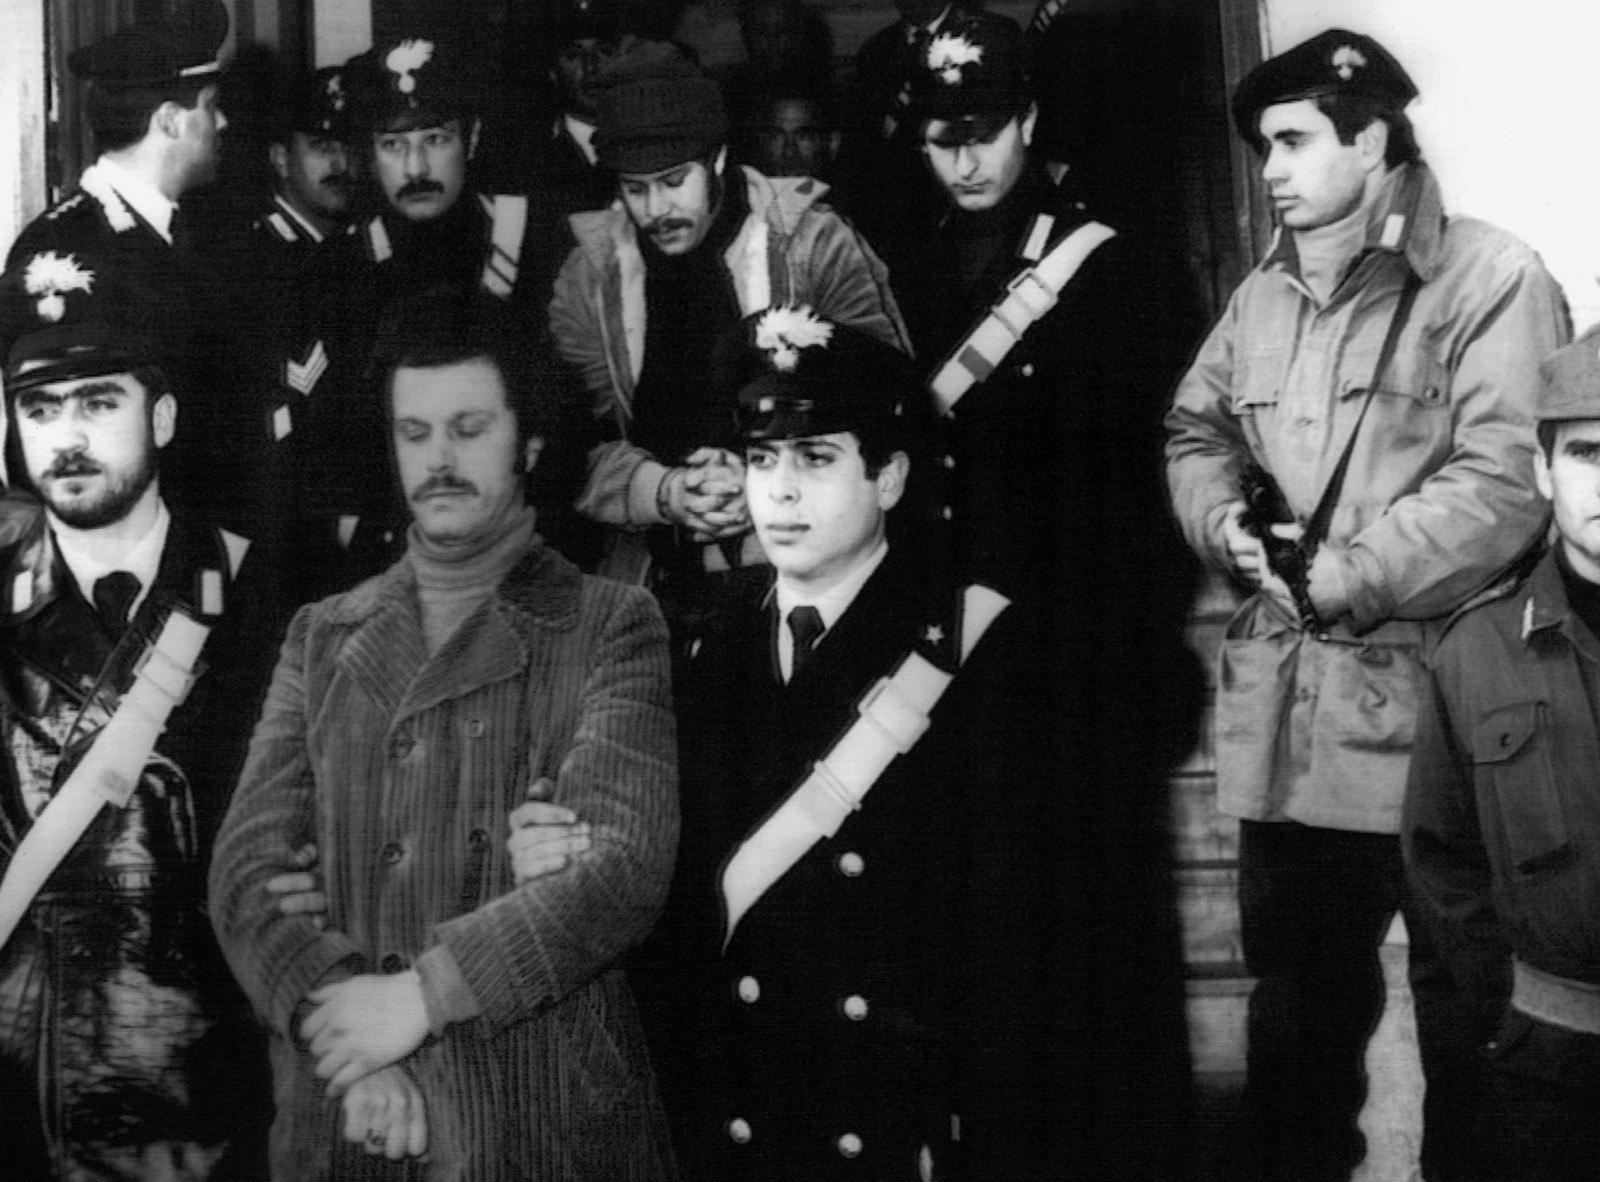 Two suspected 'Ndrangheta members being escorted to prison, Reggio Calabria, 1981